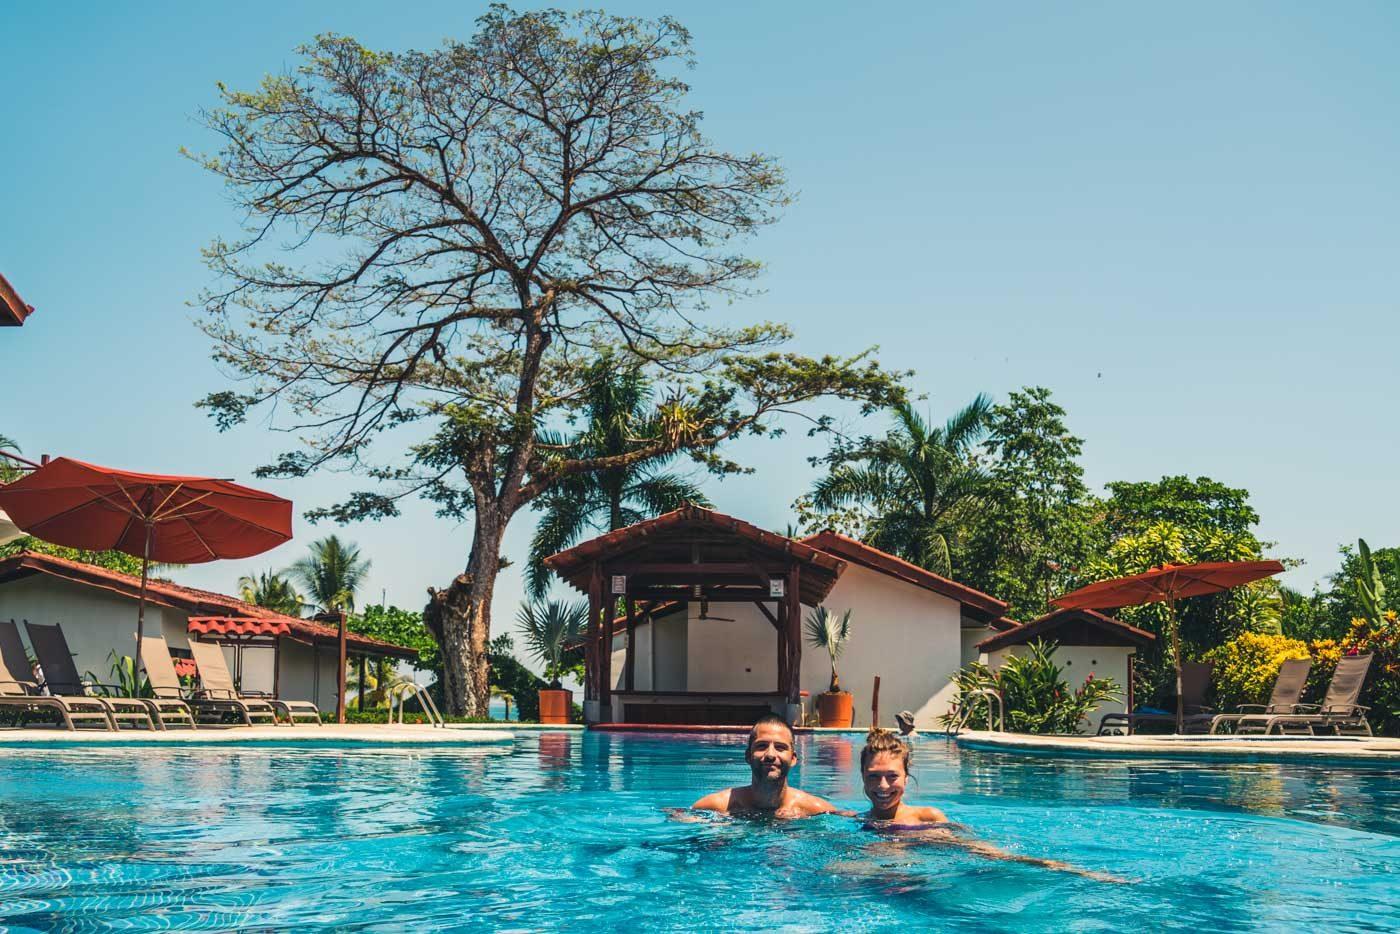 Puerto Jimenez hotels: Agua Dulce Resort in Costa Rica